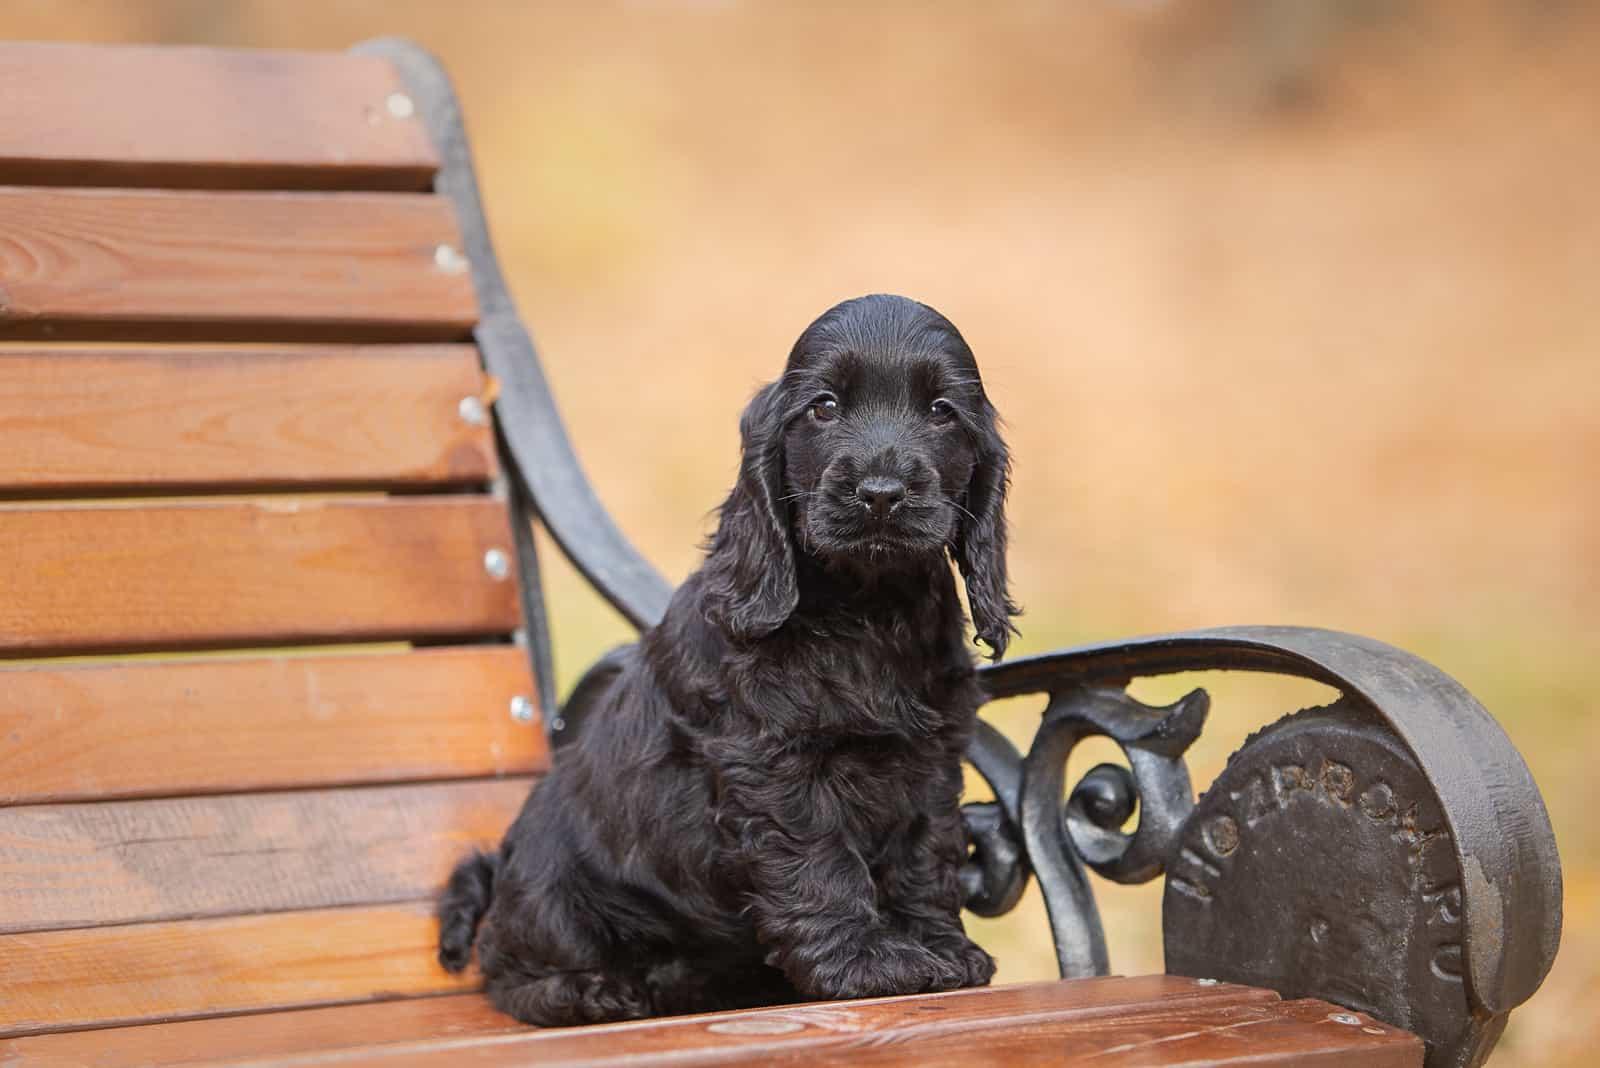 A black english cocker spaniel puppy sitting on a bench